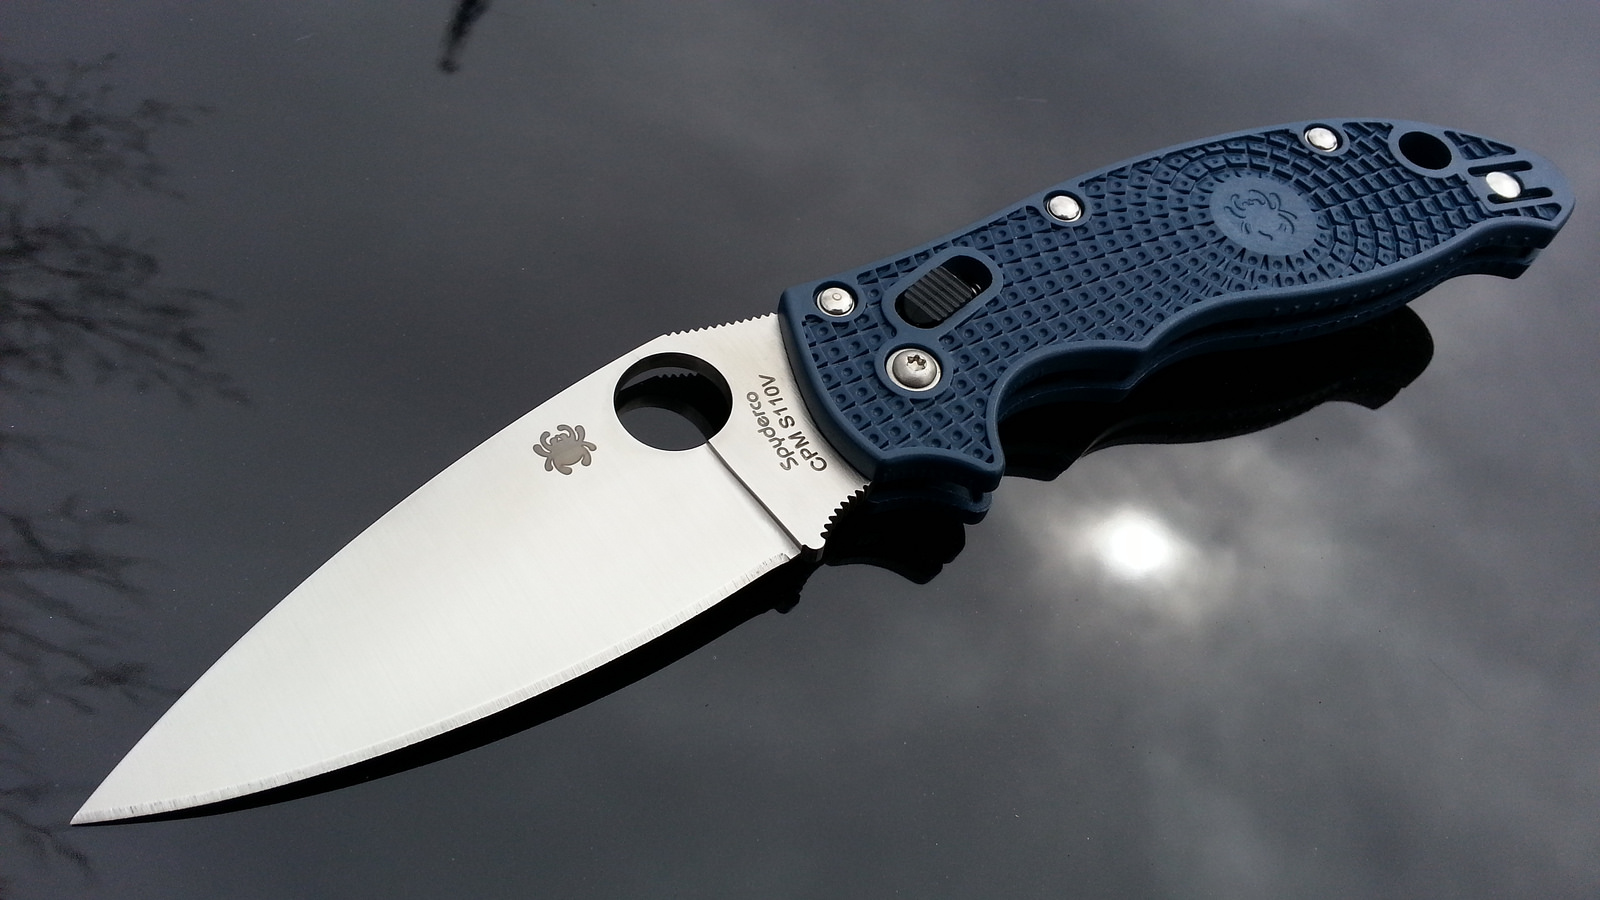 Spyderco Manix 2 183 Review 2019 Pocket Knife Info